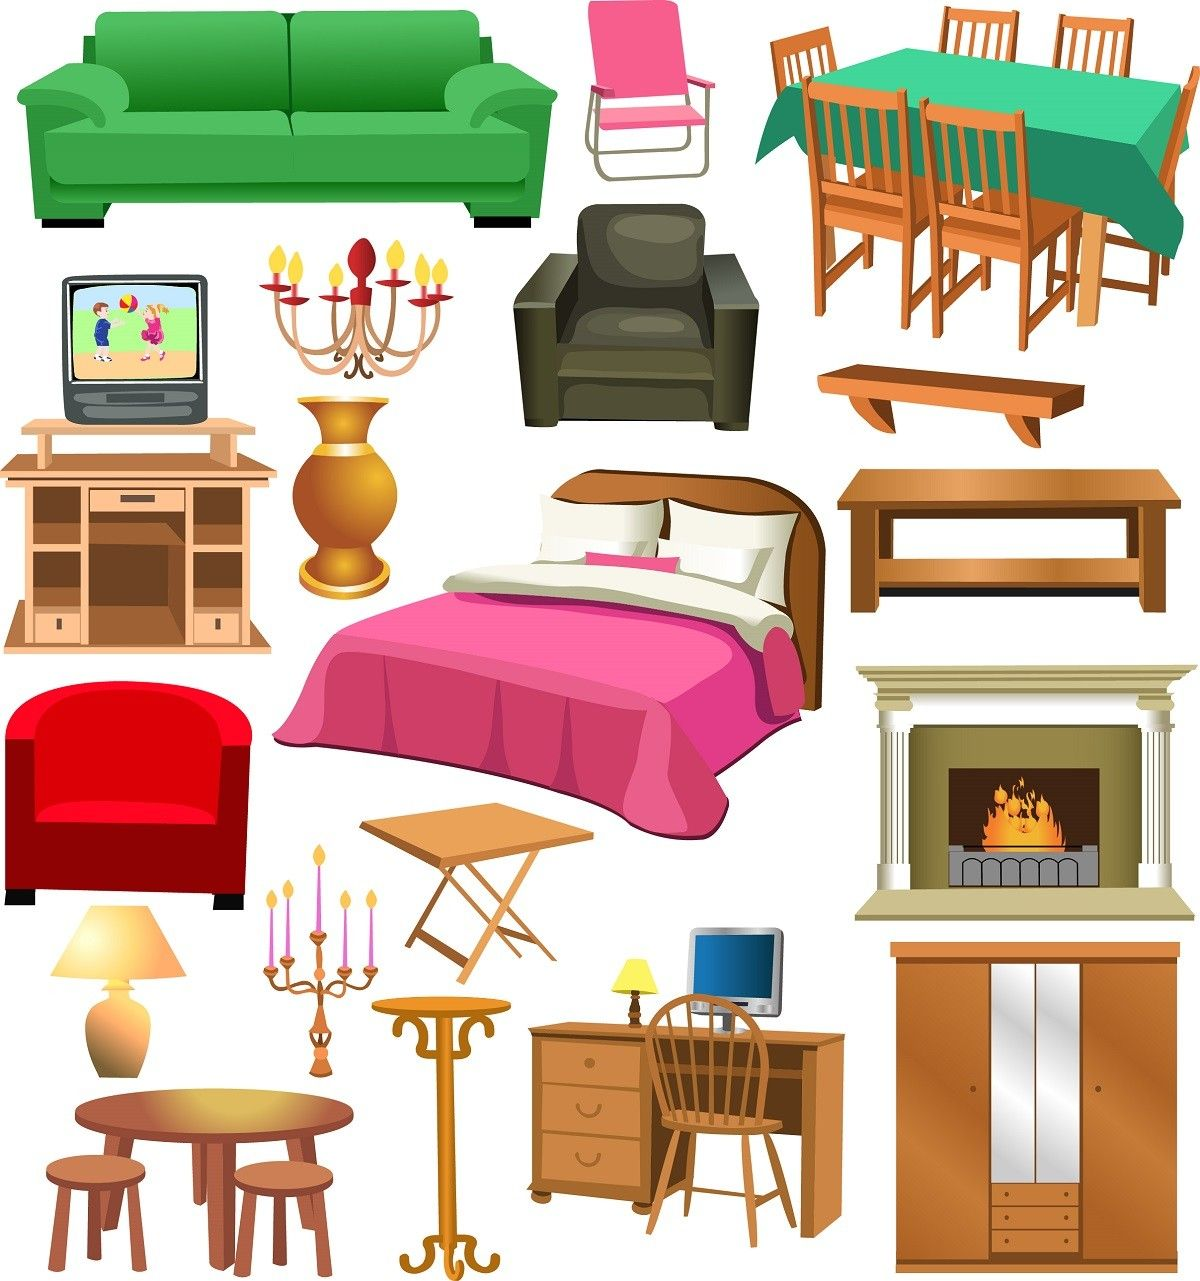 Furniture set 03 Bed chair clotheshanger cupboard